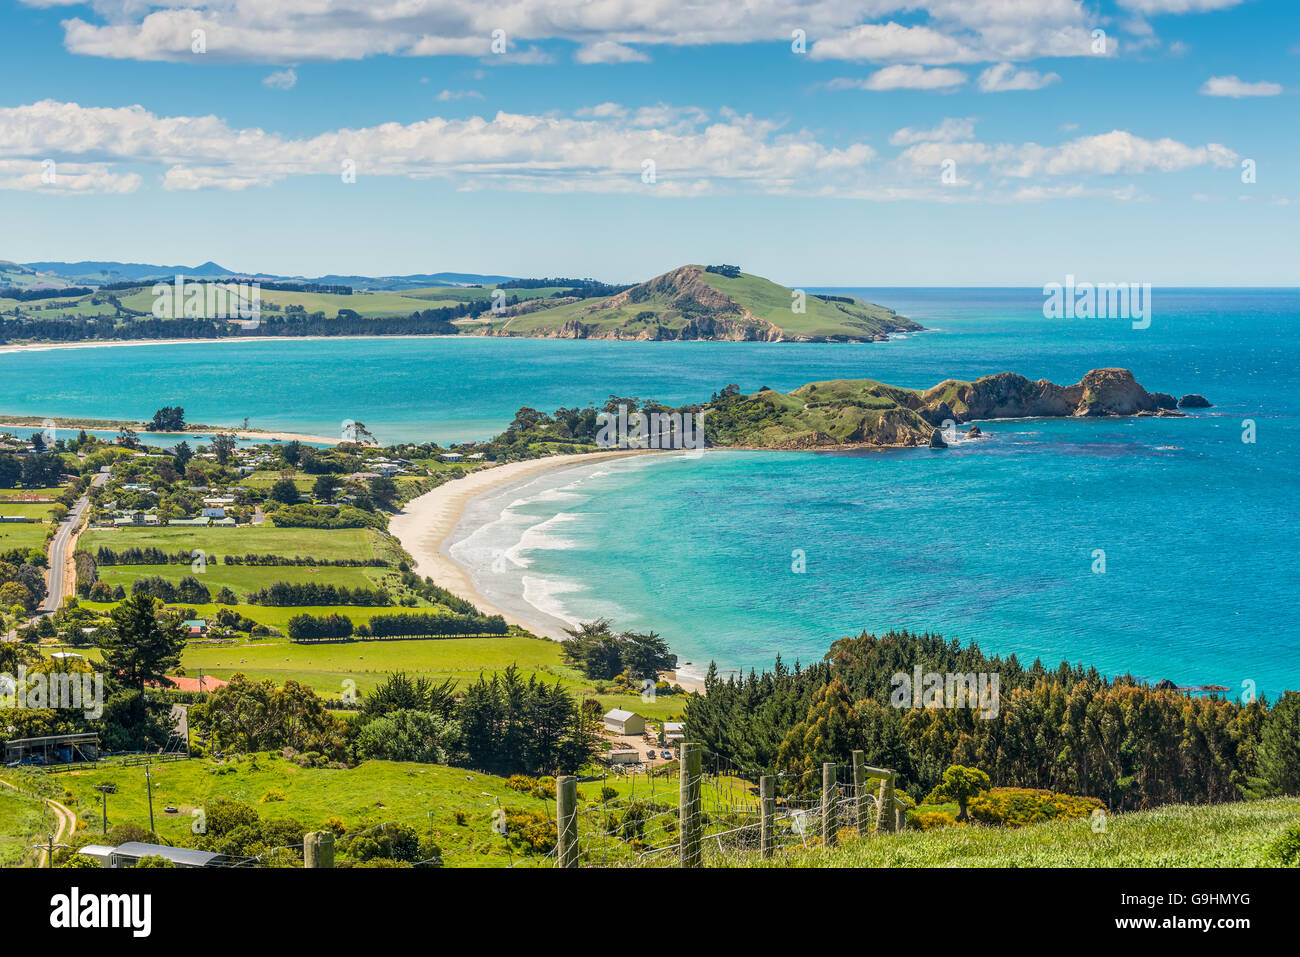 Karitane coastline, Huriawa Peninsula in the center (Historic Maori Pa Site), Karitane near Dunedin New Zealand Stock Photo